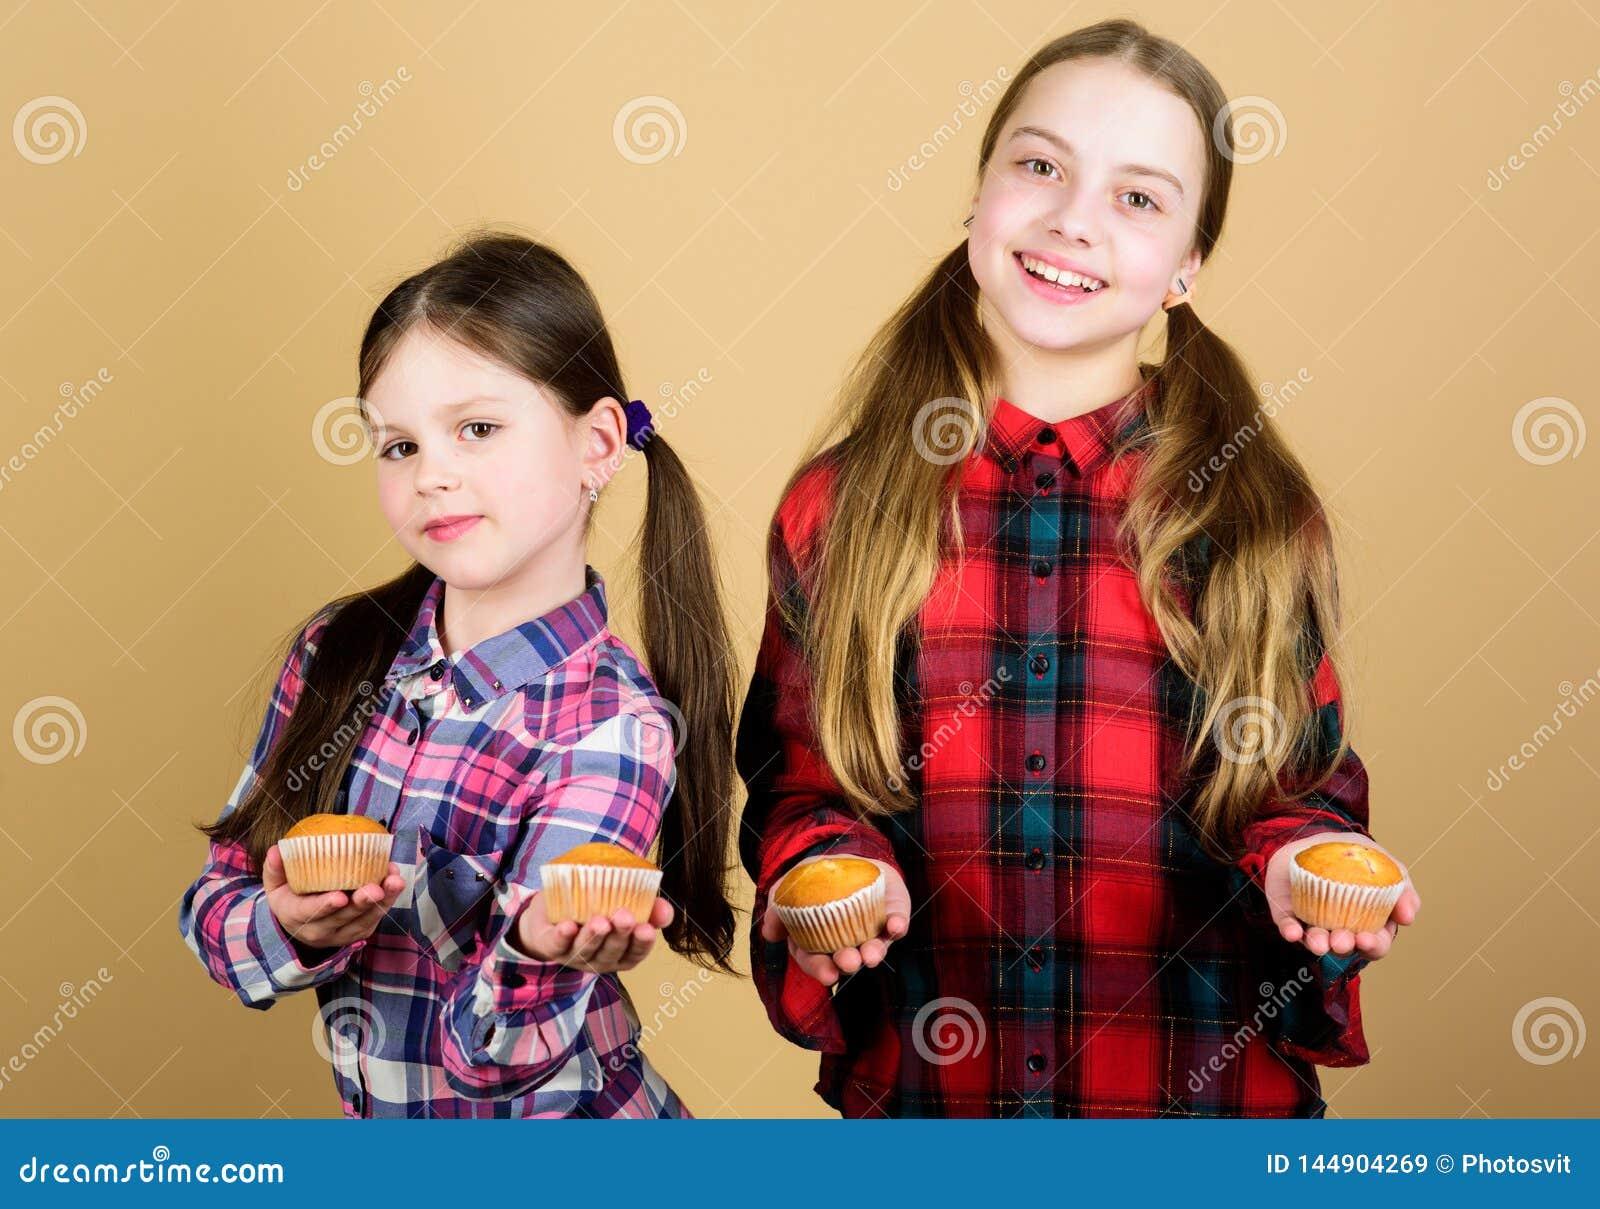 Dieet gezonde voeding en calorie Yummy muffins Meisjes leuke jonge geitjes die muffins eten of cupcake Zoet dessert culinair